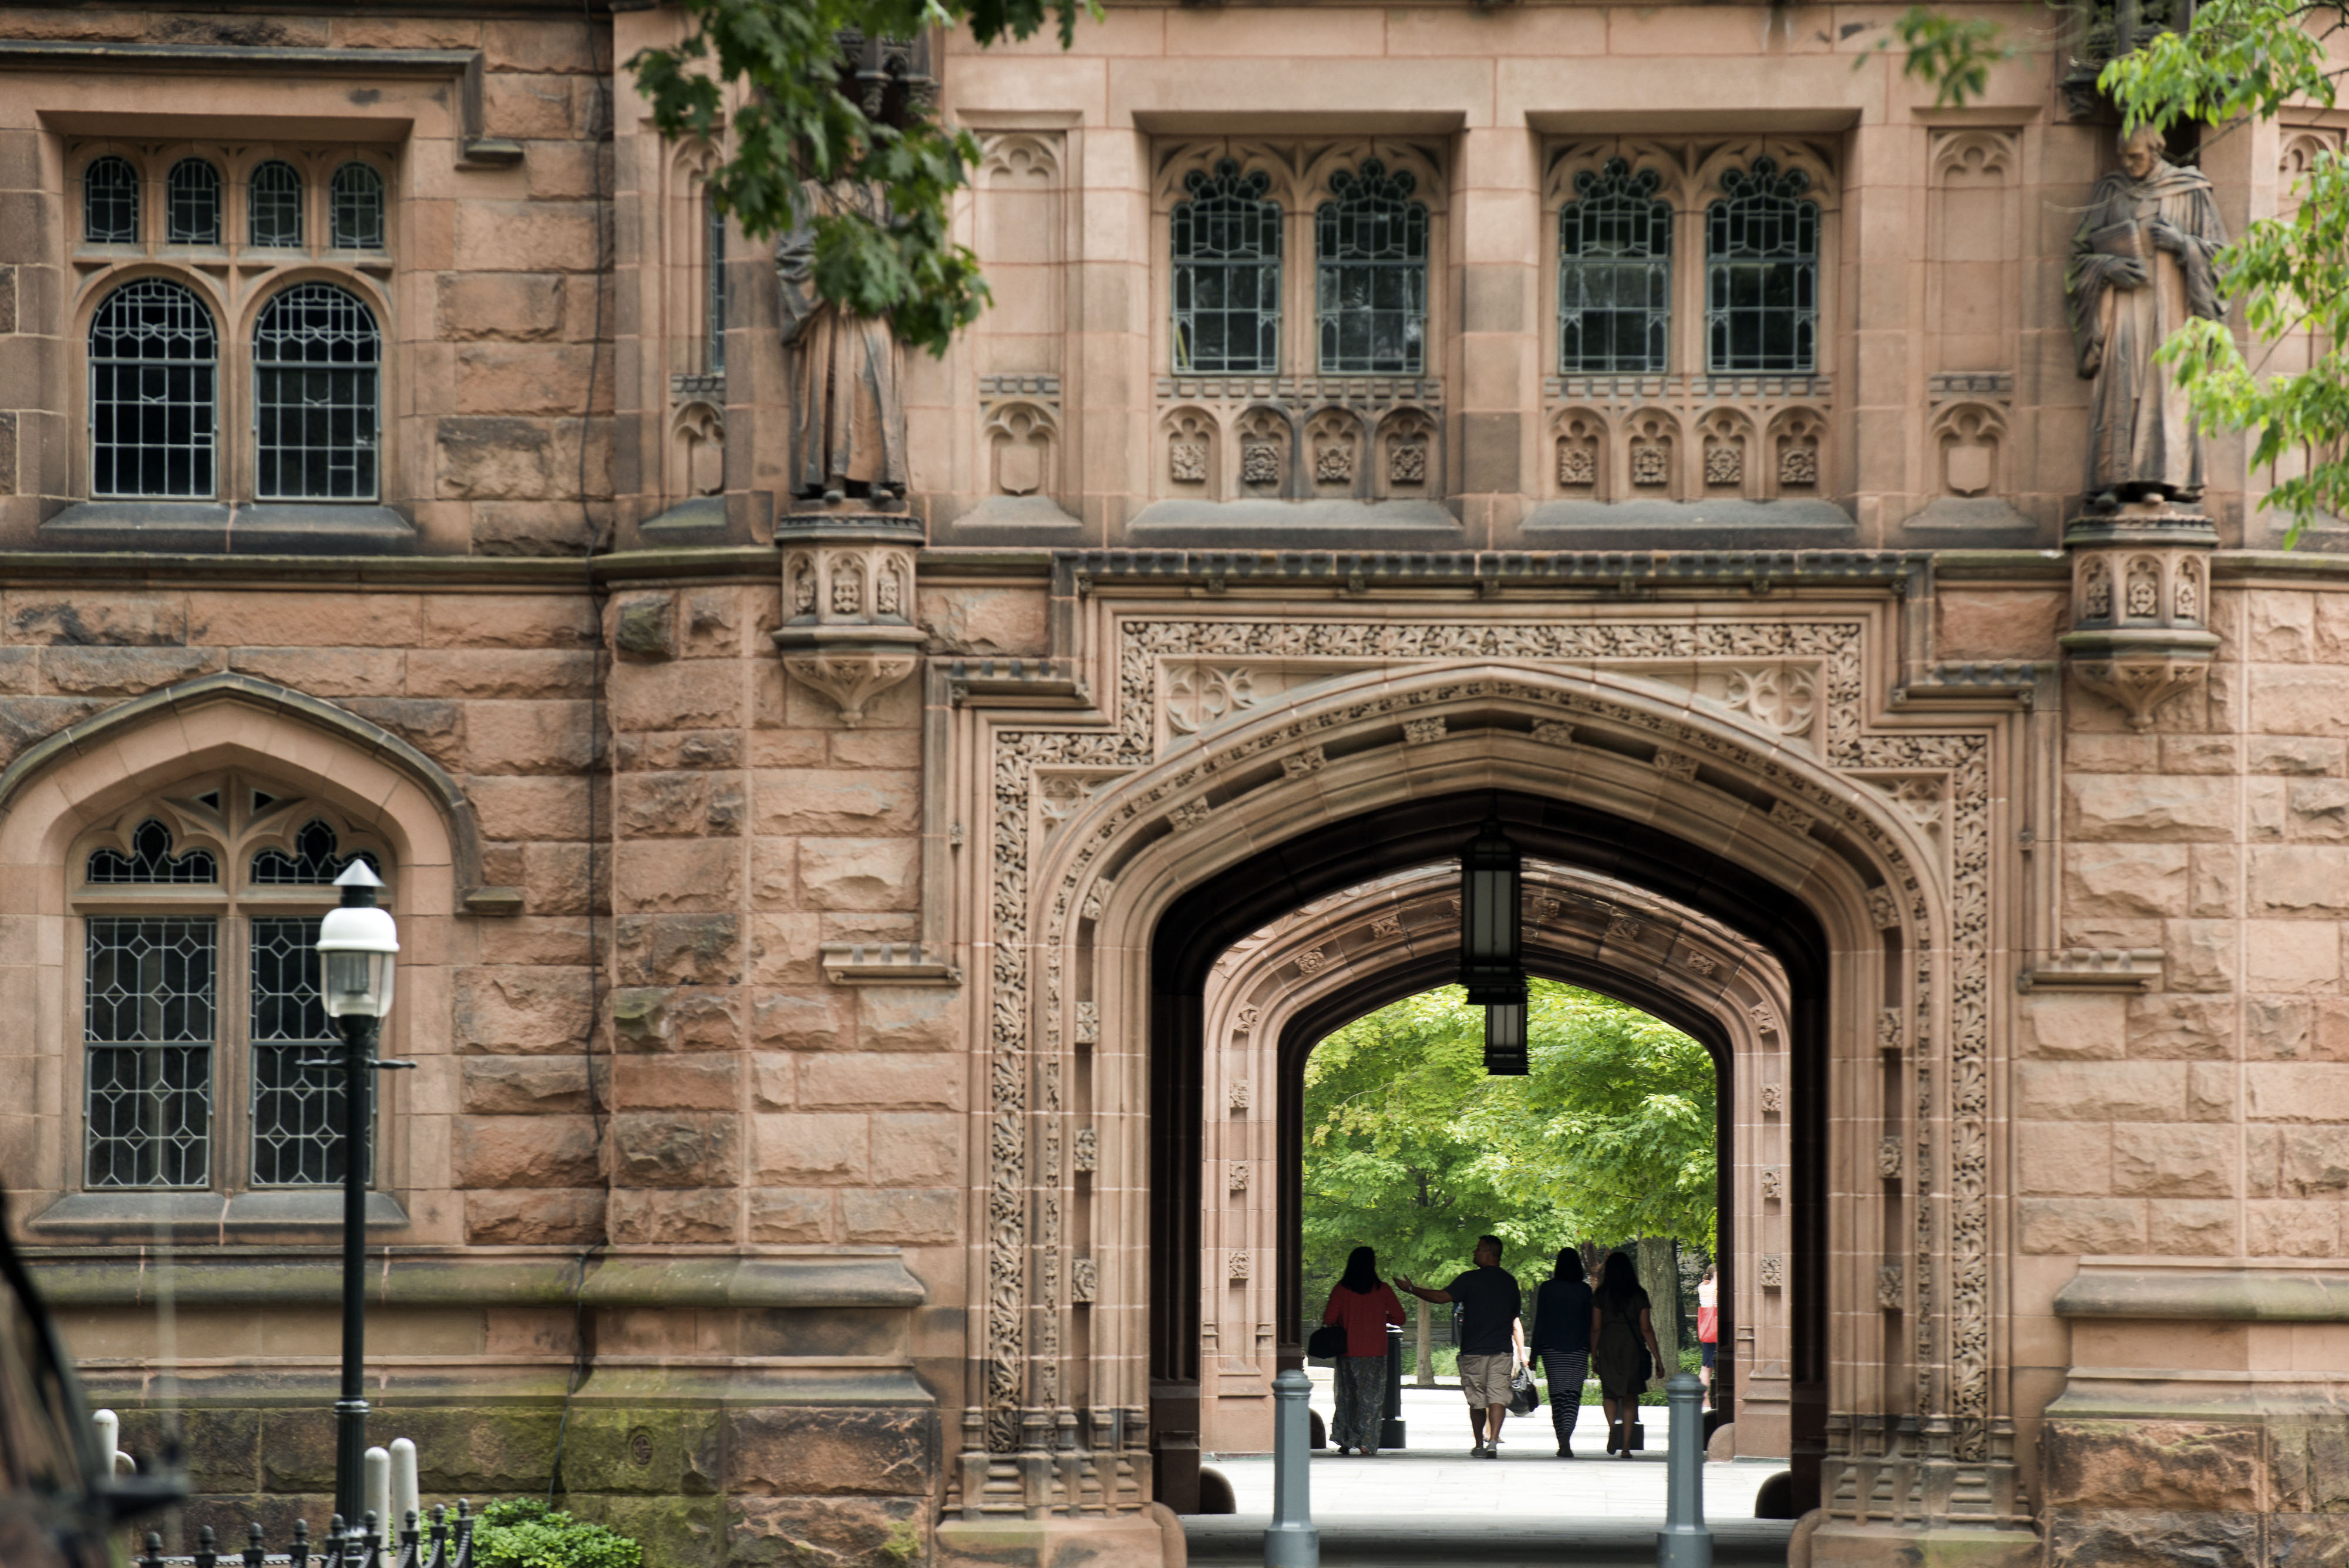 People walk on Princeton University campus in Princeton, New Jersey, U.S., on Friday, Aug. 30, 2013. Photographer: Craig Warga/Bloomberg via Getty Images